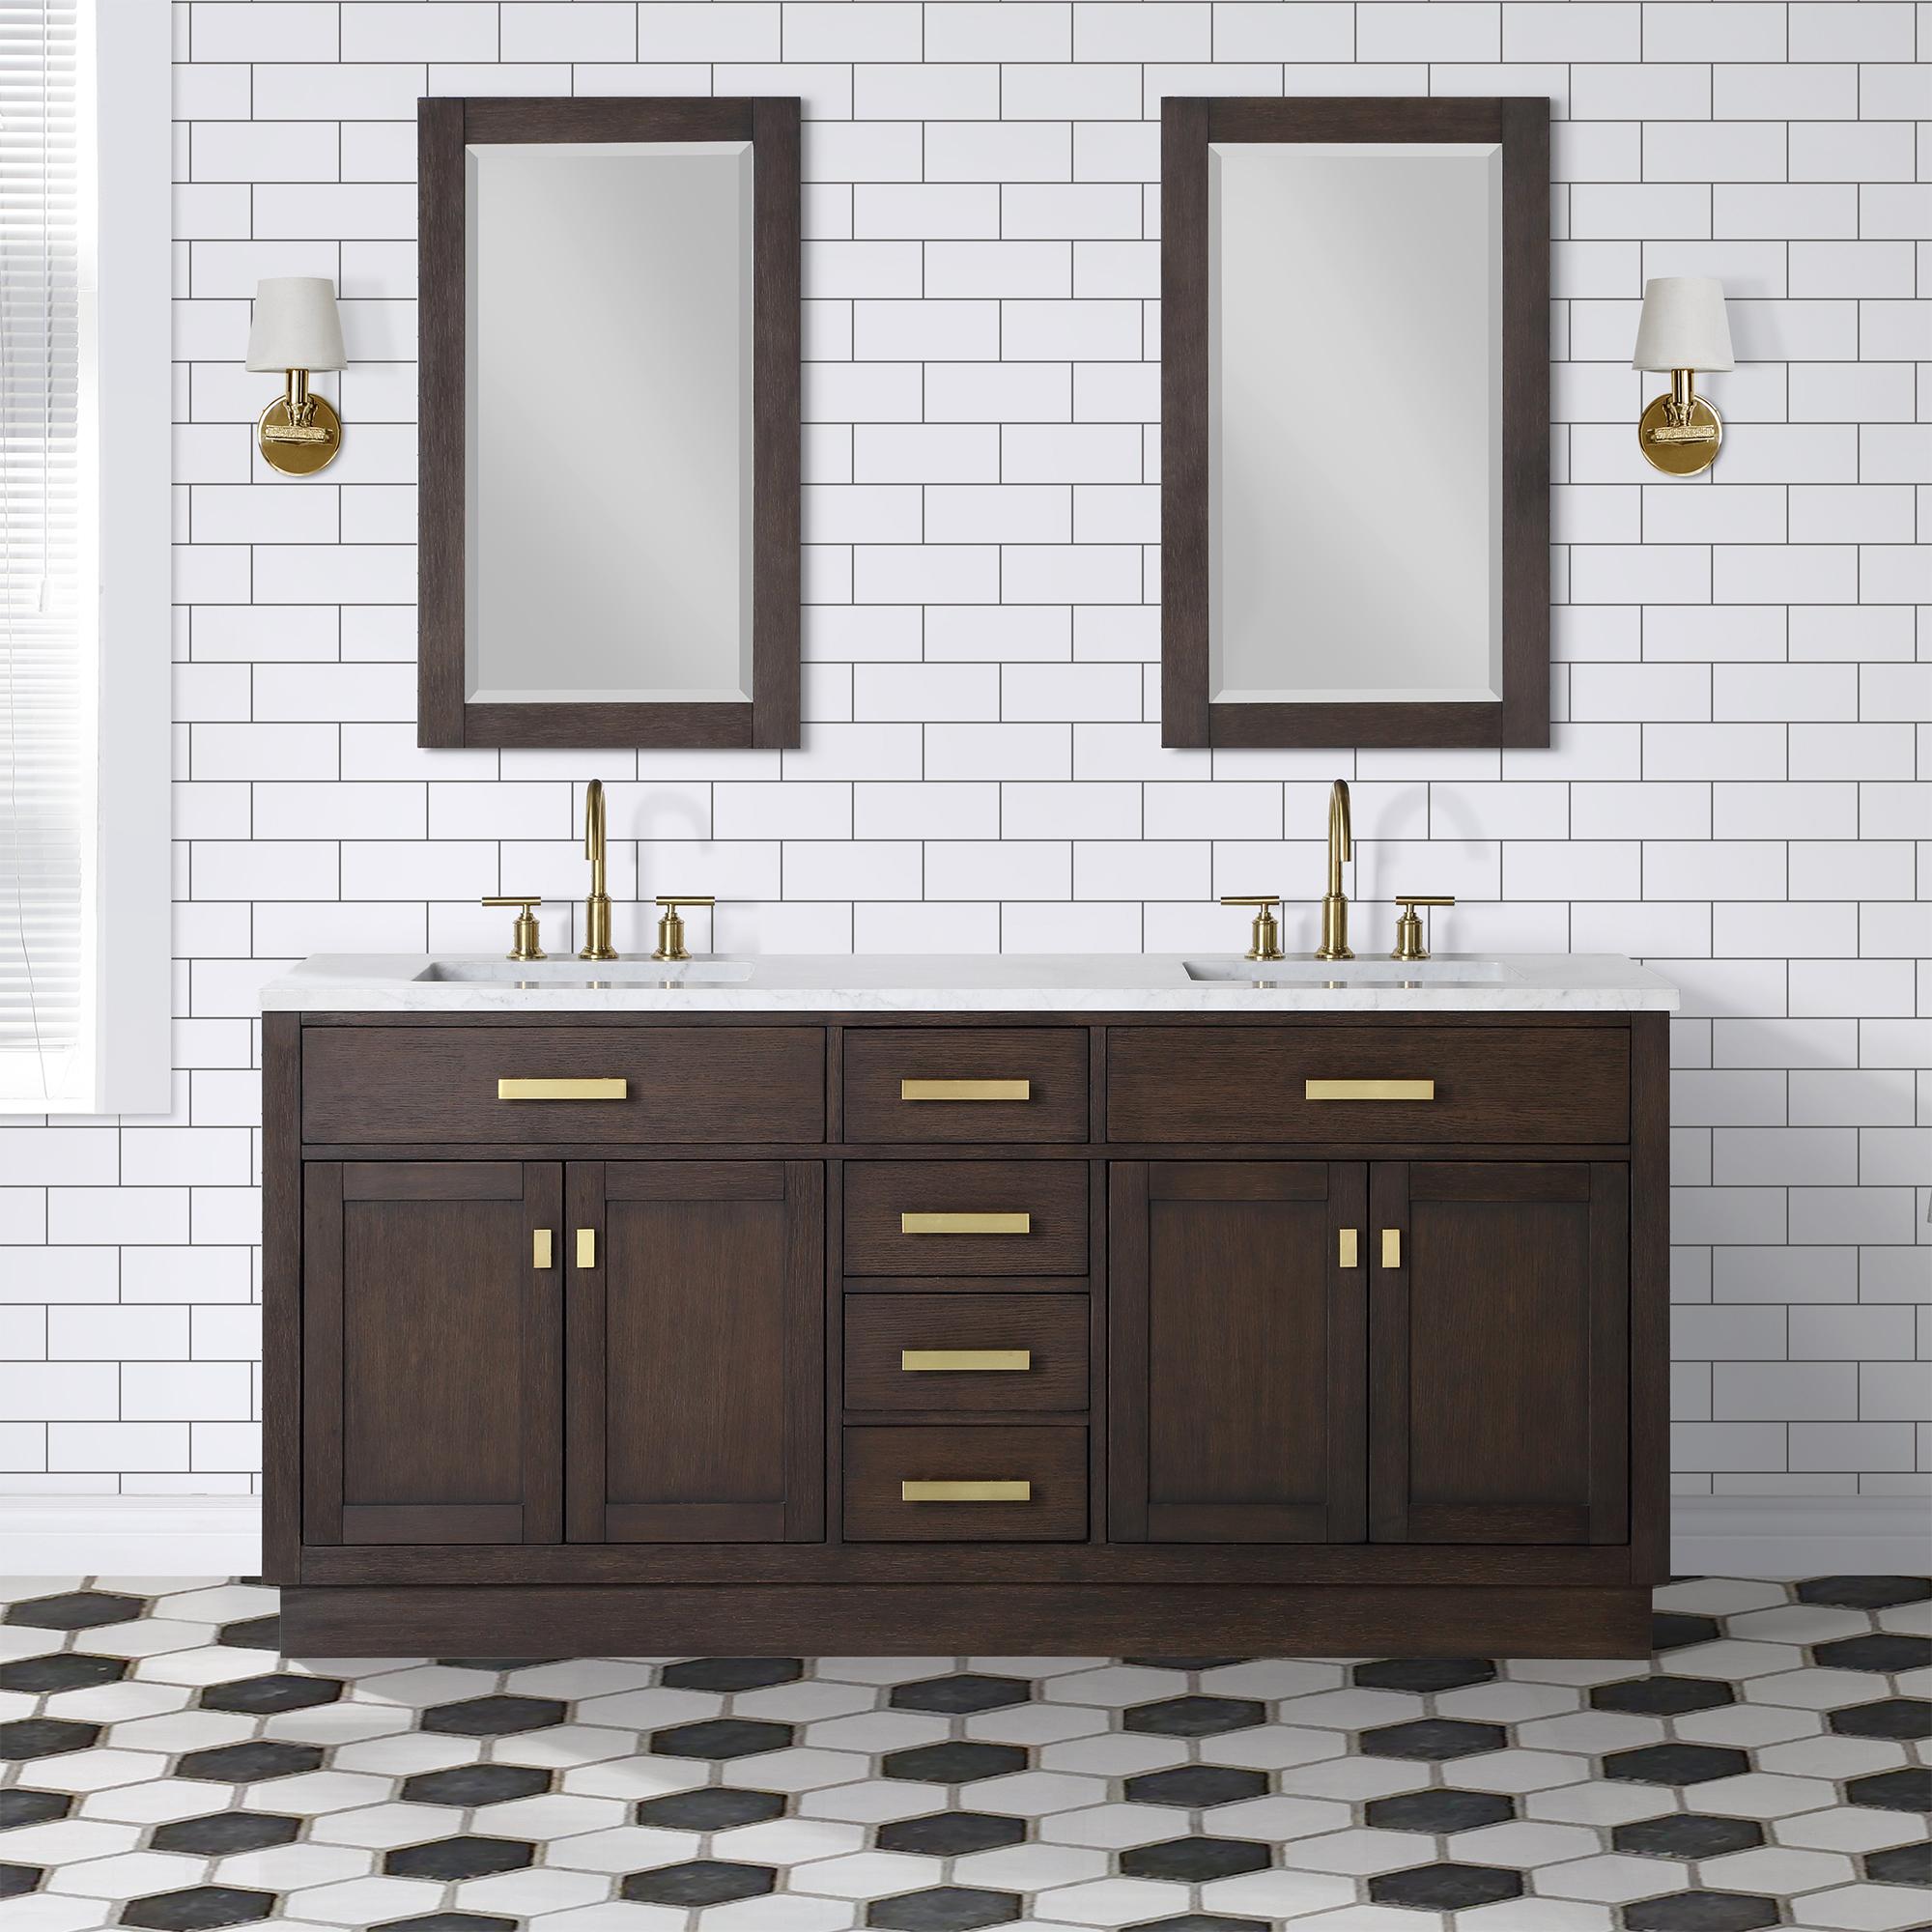 "72"" Brown Oak Double Bathroom Vanity with Seamless Italian Carrara White Marble Top"